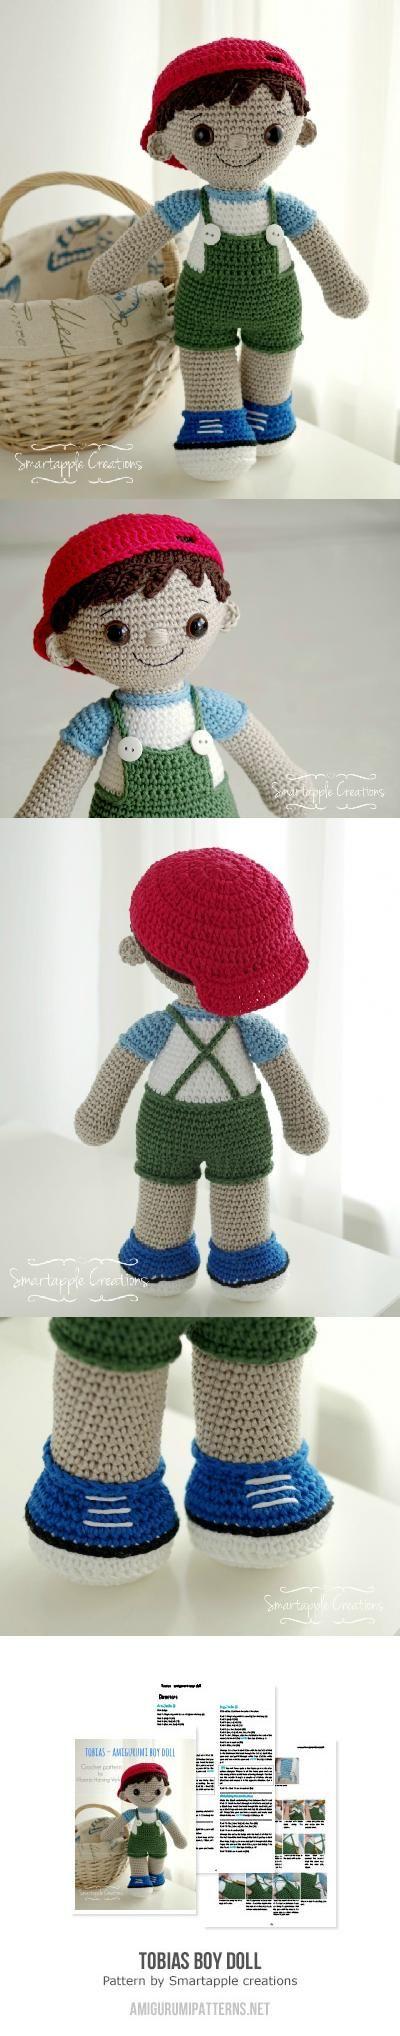 Amigurumi Boy Doll Pattern : 83 best images about Munecos on Pinterest Amigurumi doll ...